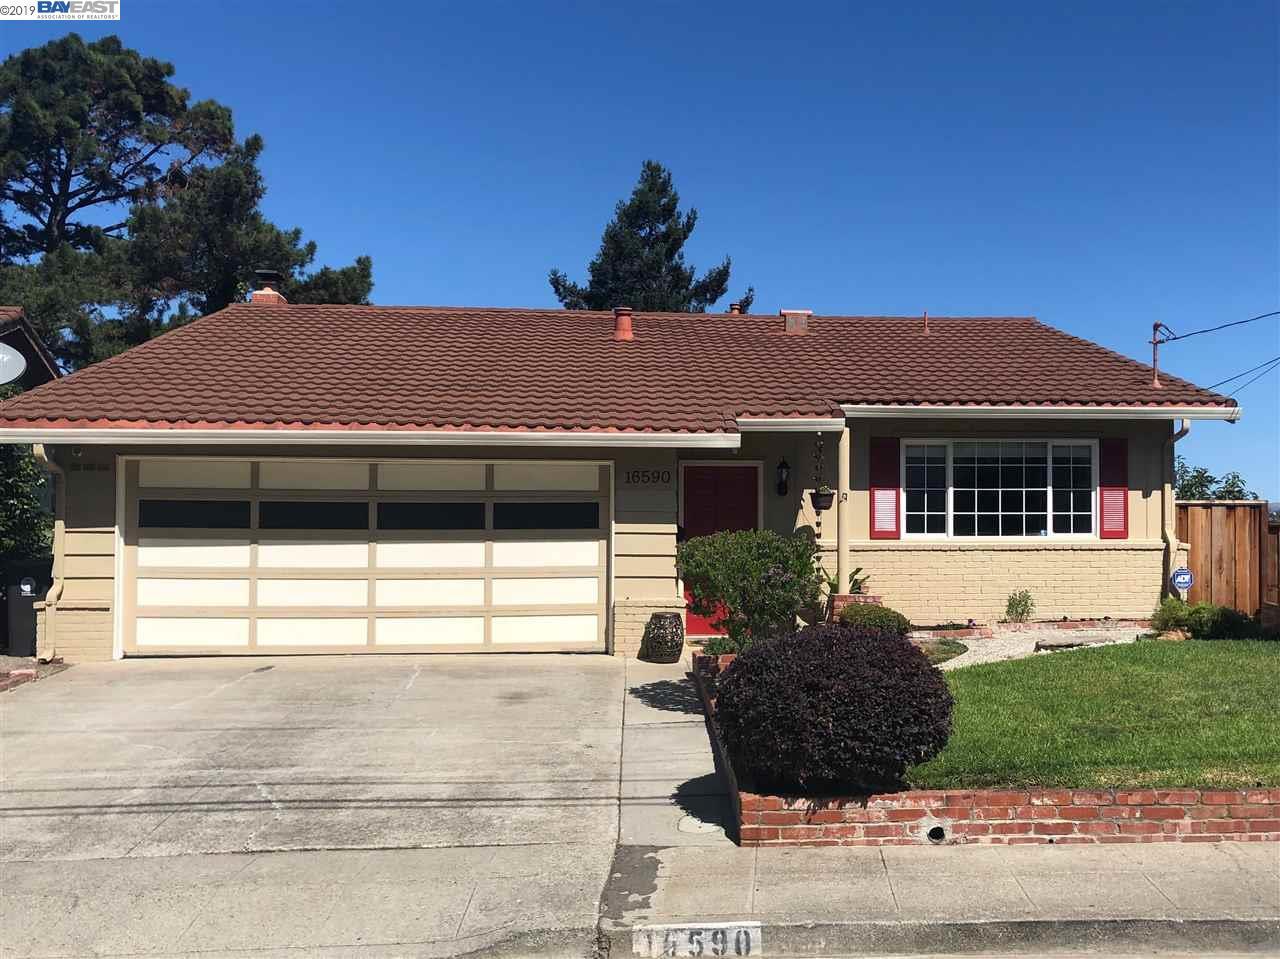 16590 Cowell St San Leandro, CA 94578